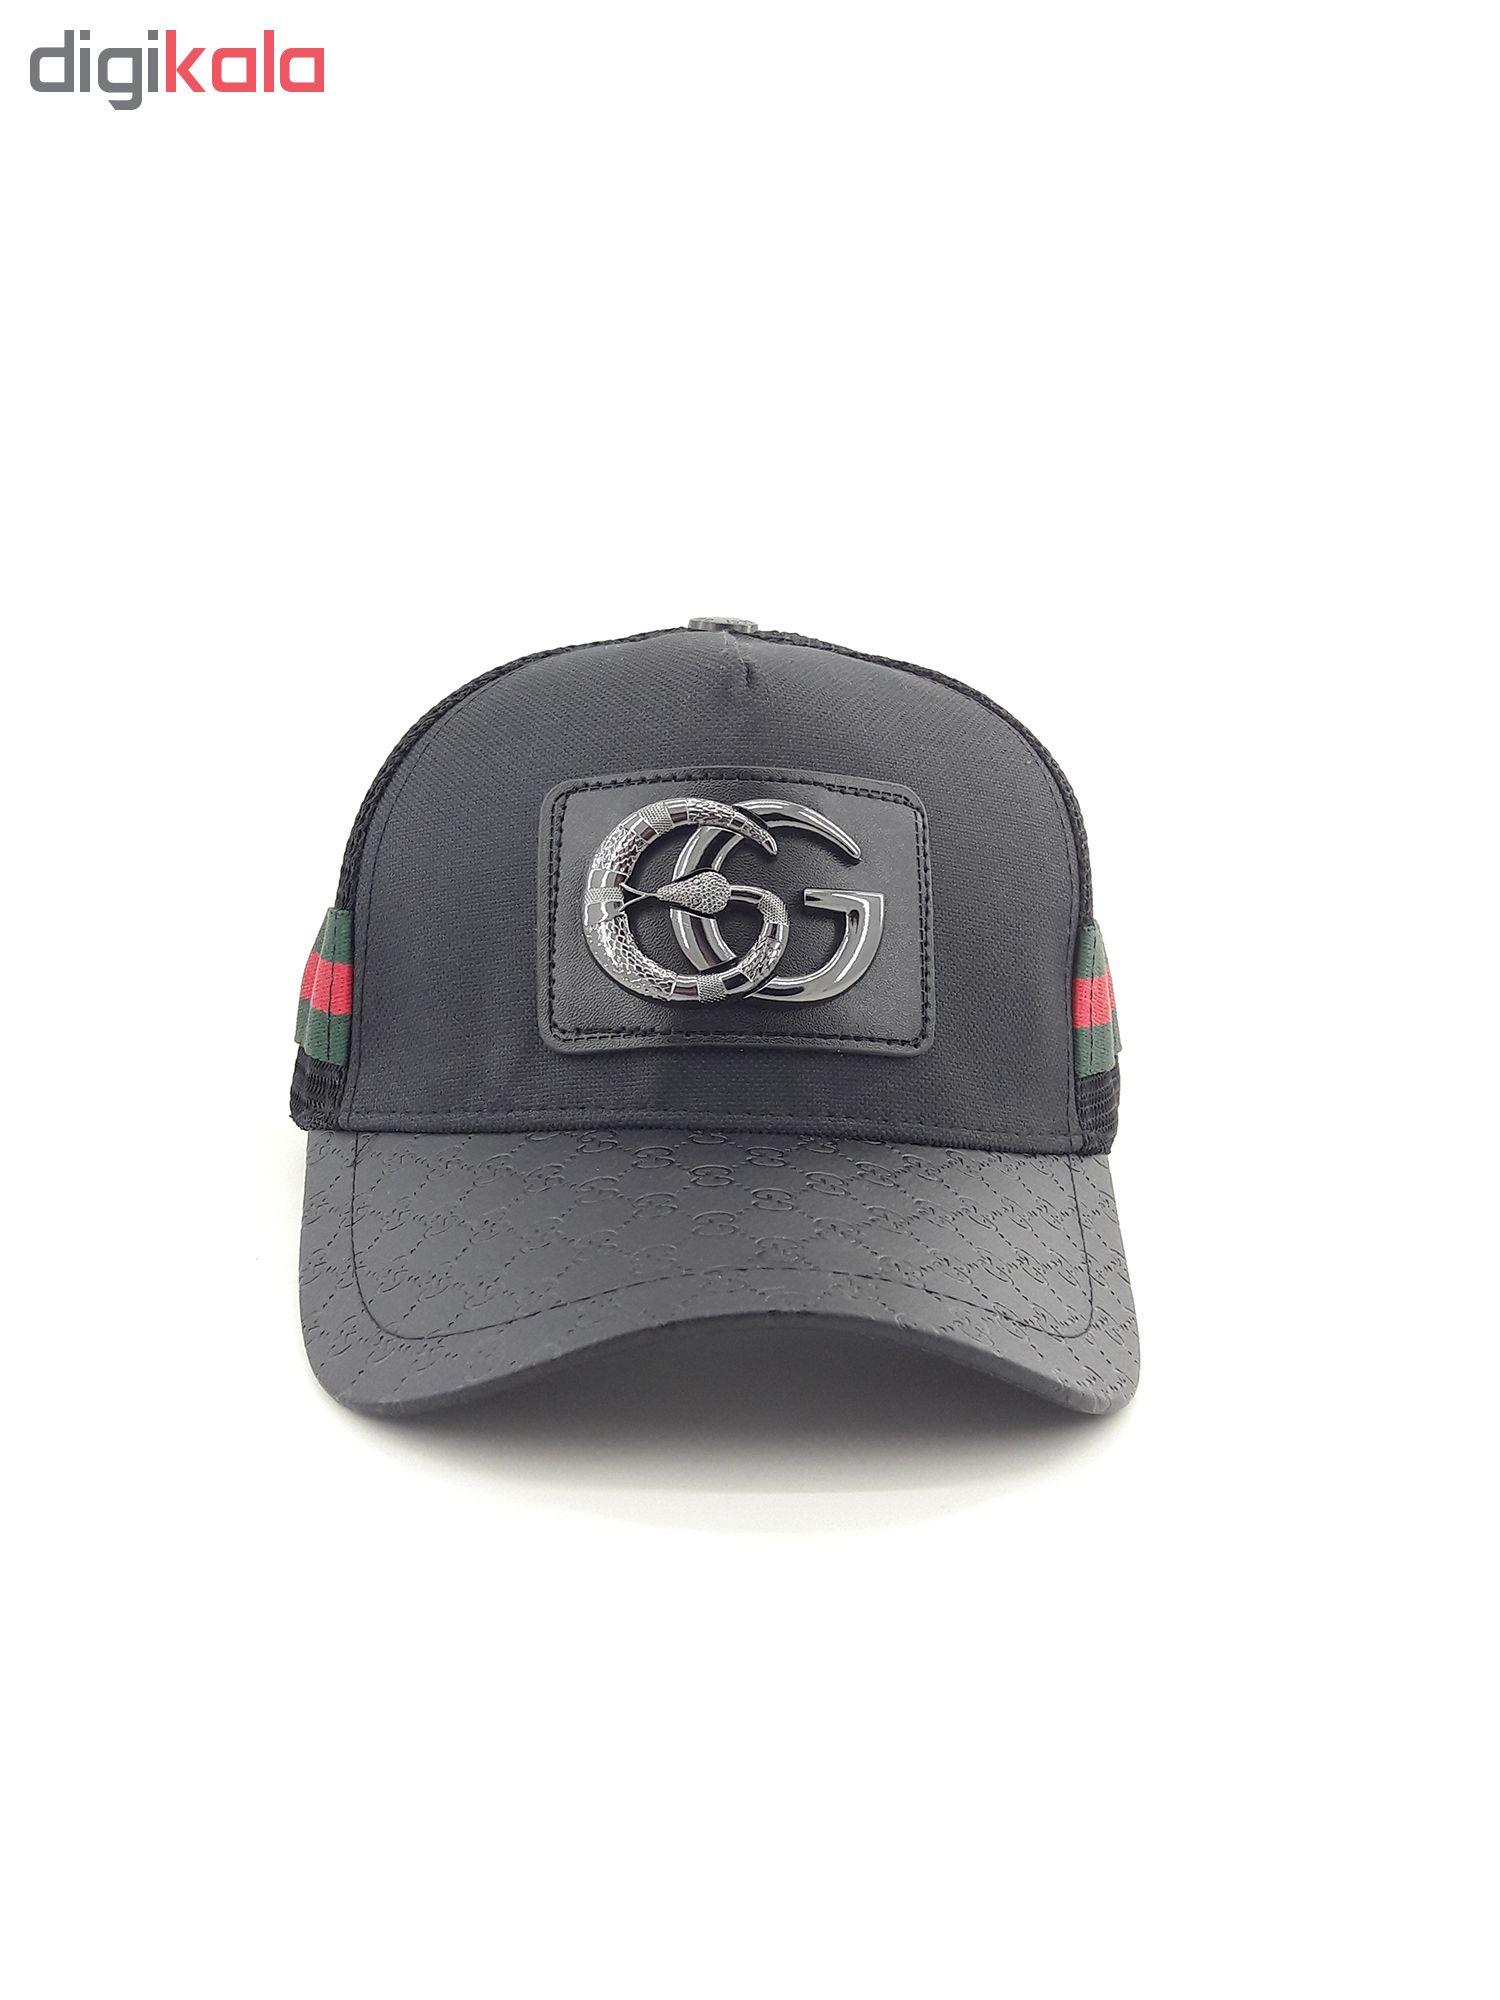 کلاه کپ مردانه مدل Gc.bl-01